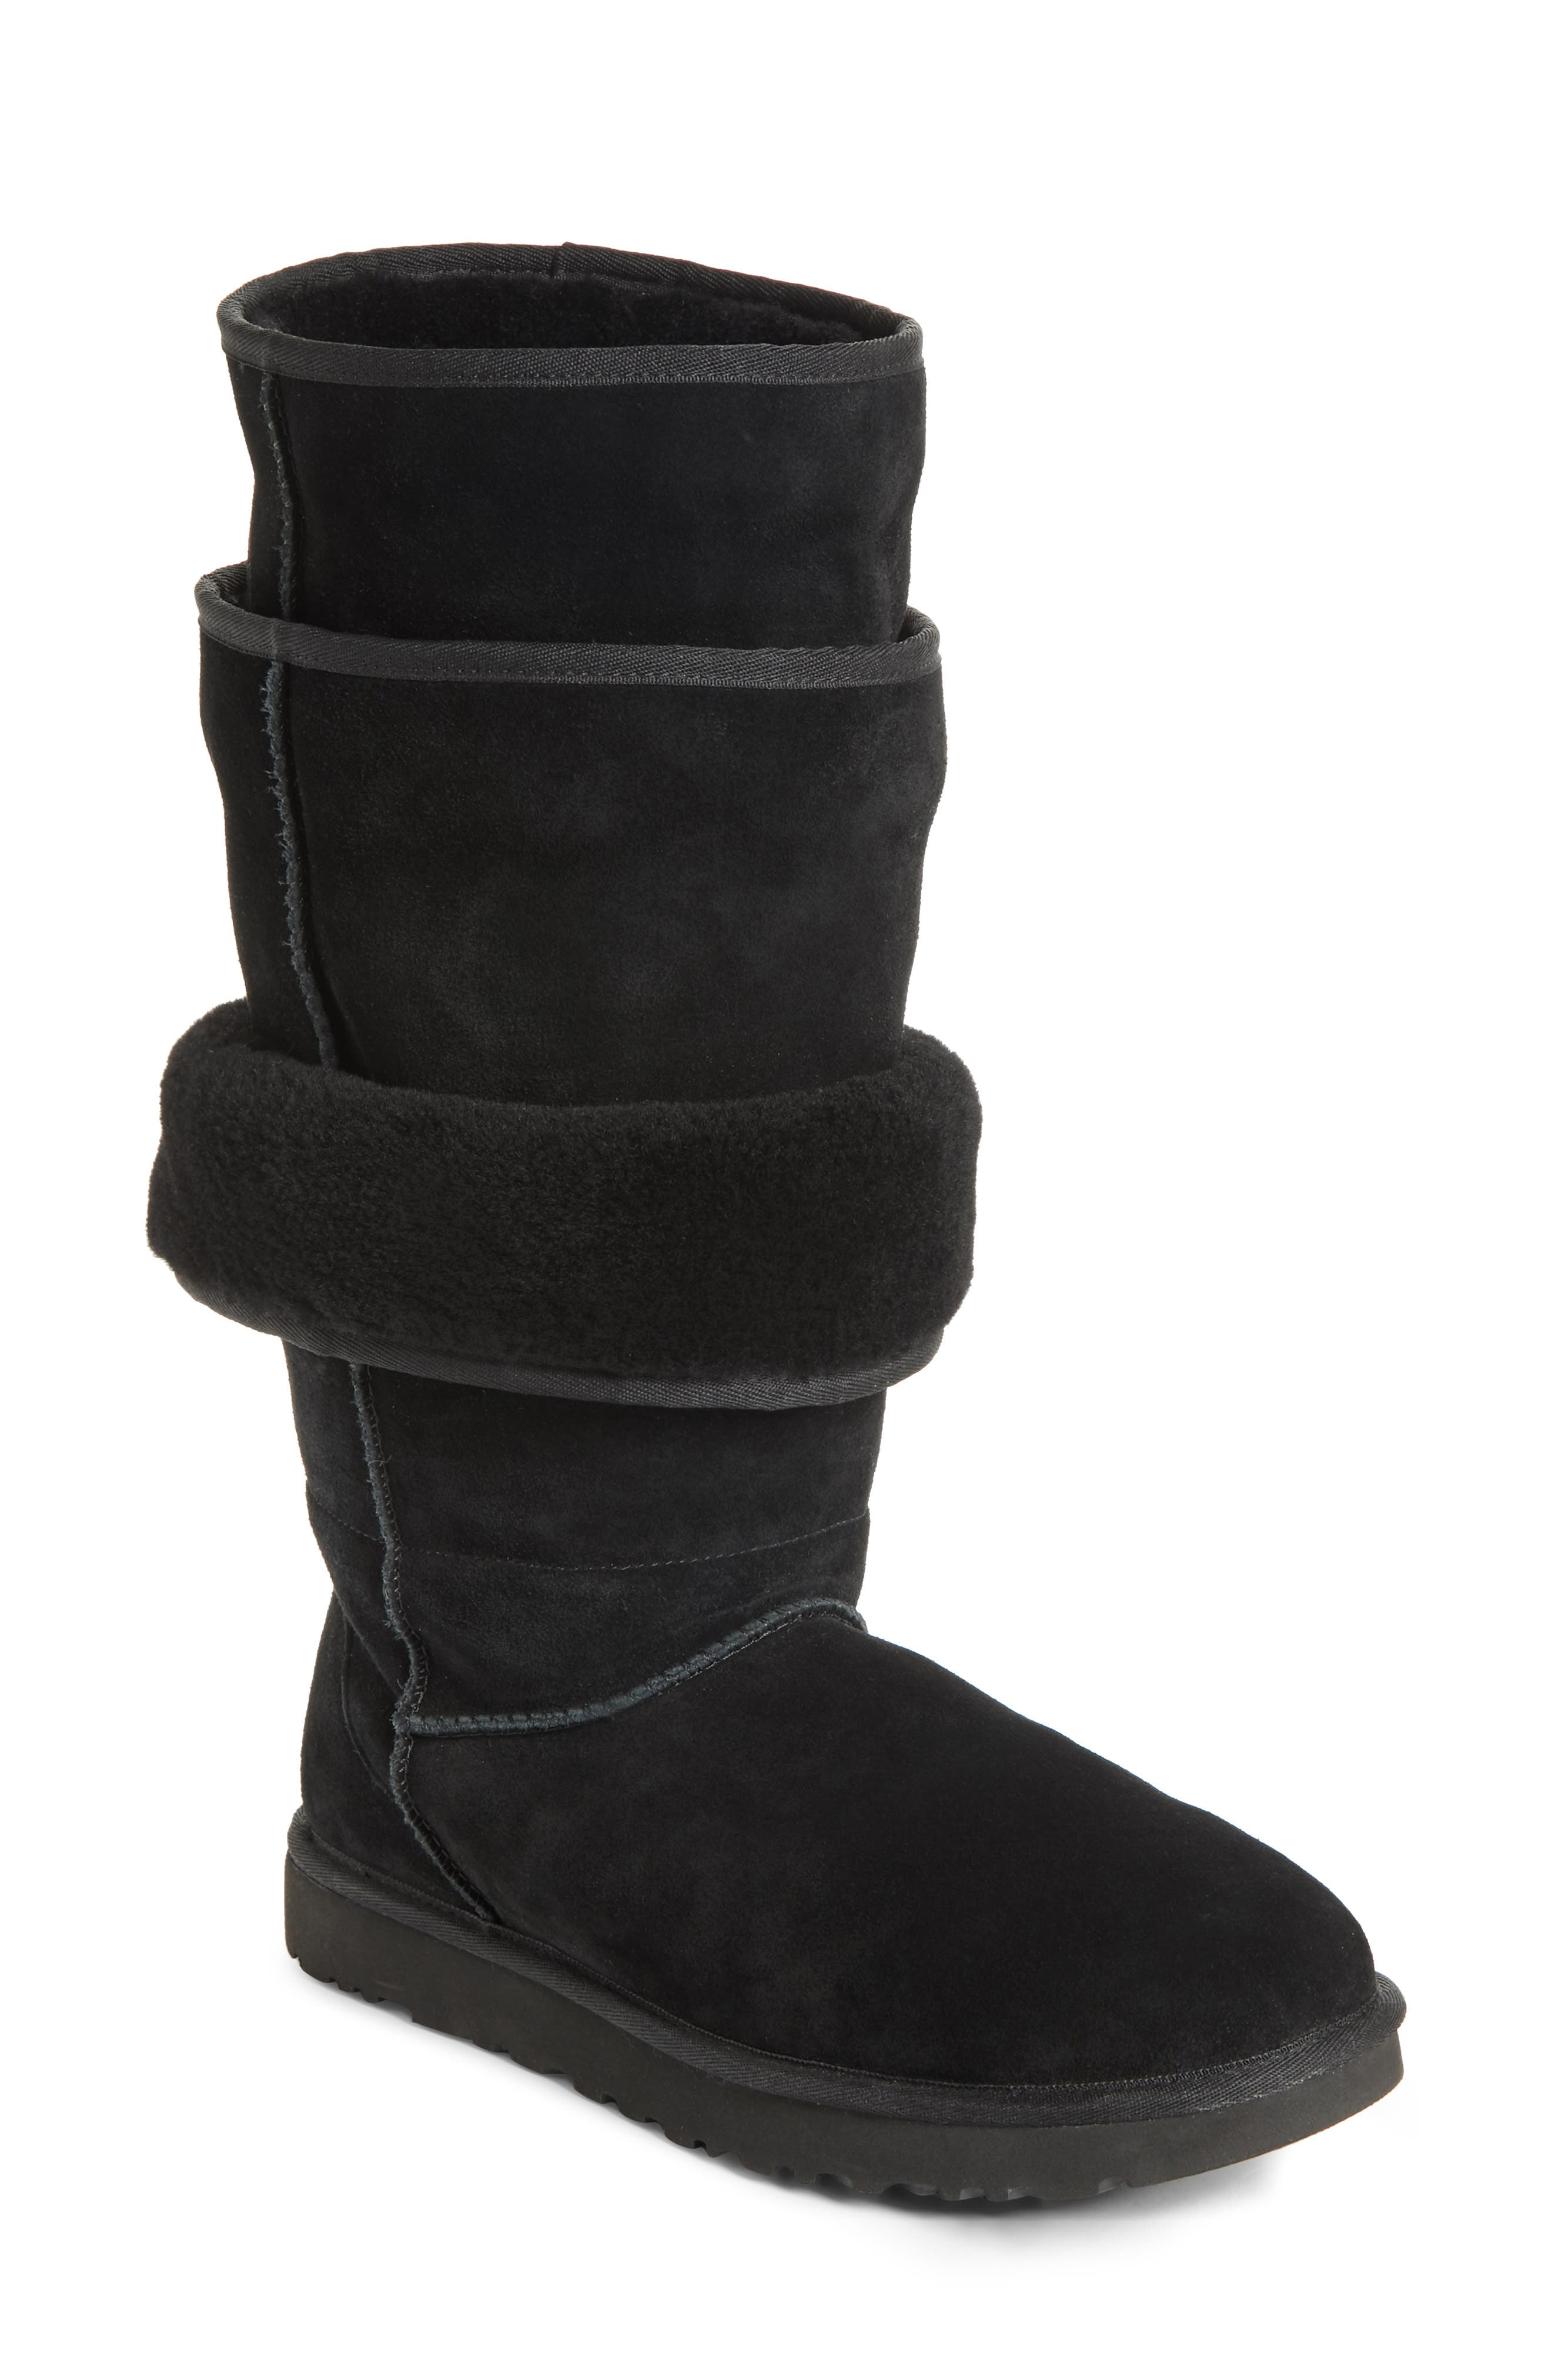 x UGG<sup>®</sup> Layered Boot,                         Main,                         color, NOIR